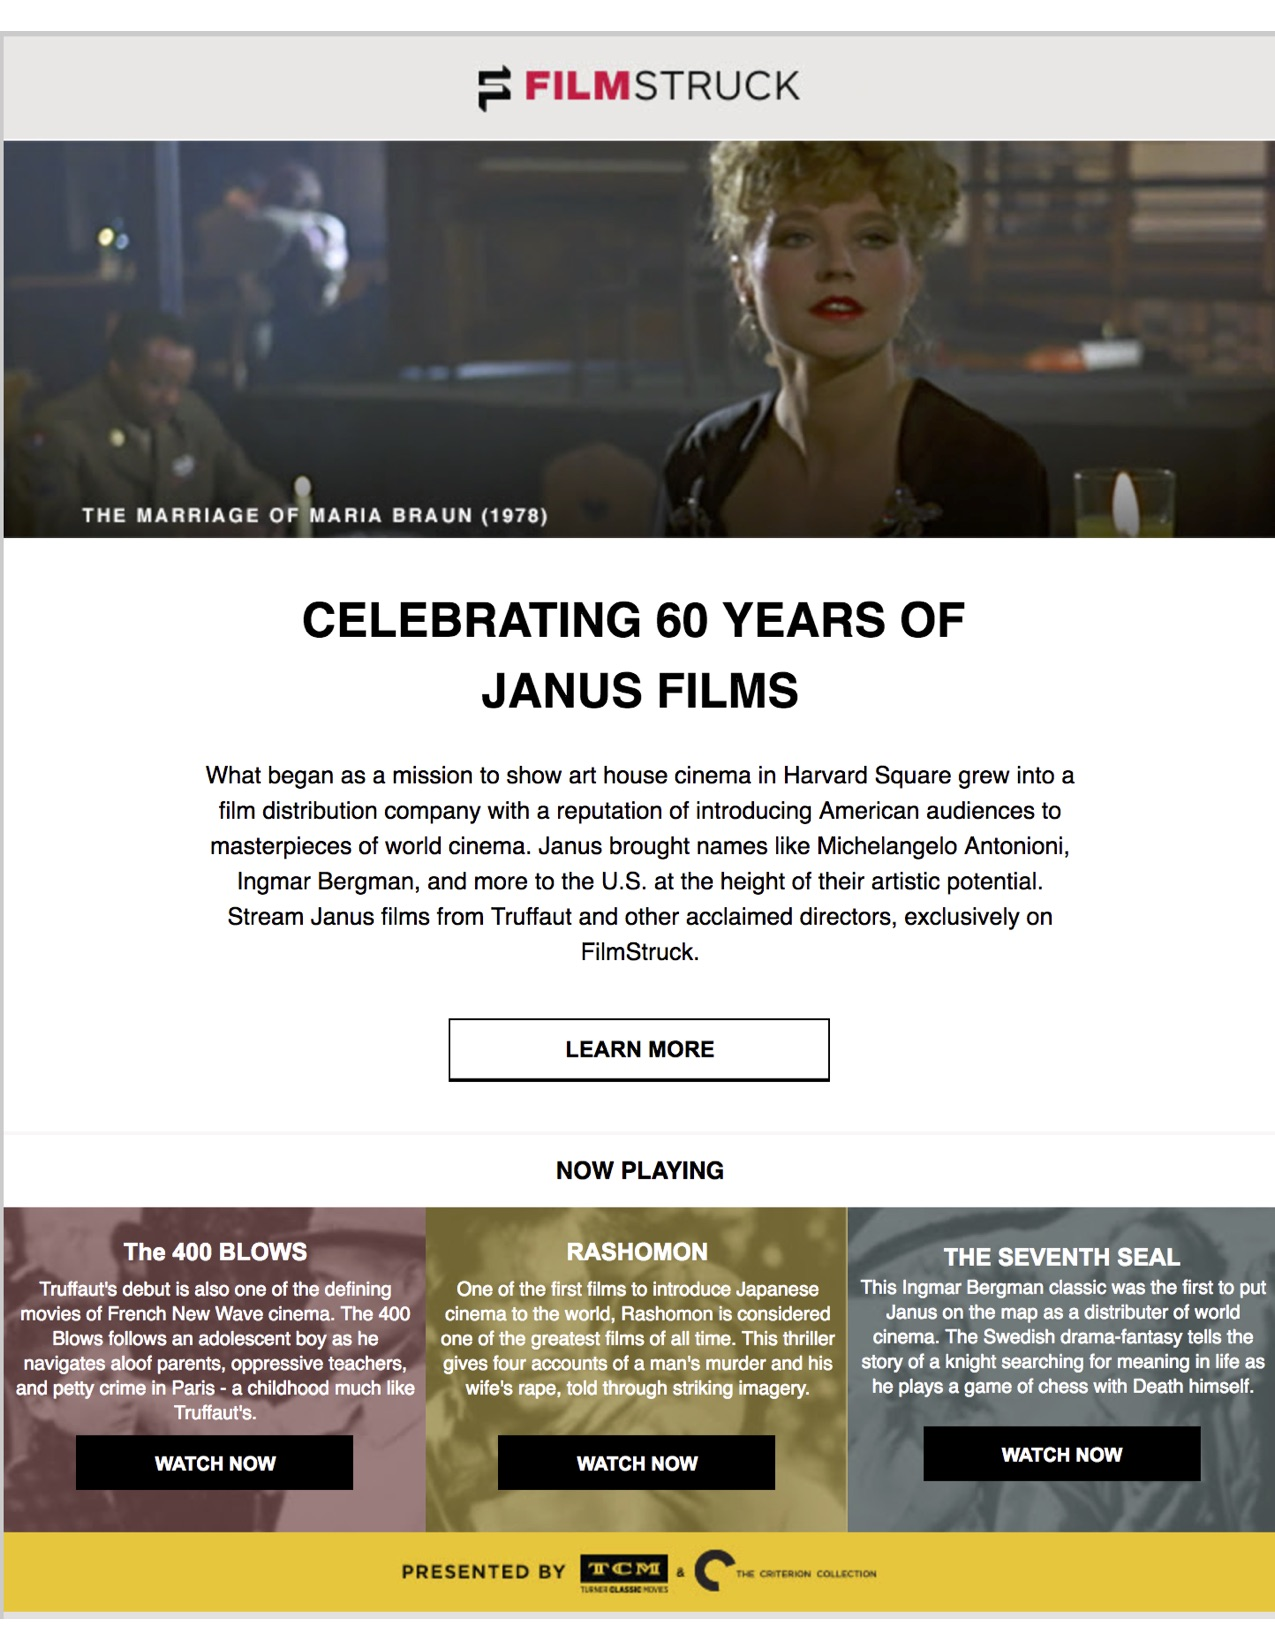 FilmStruck Marketing Email.jpg